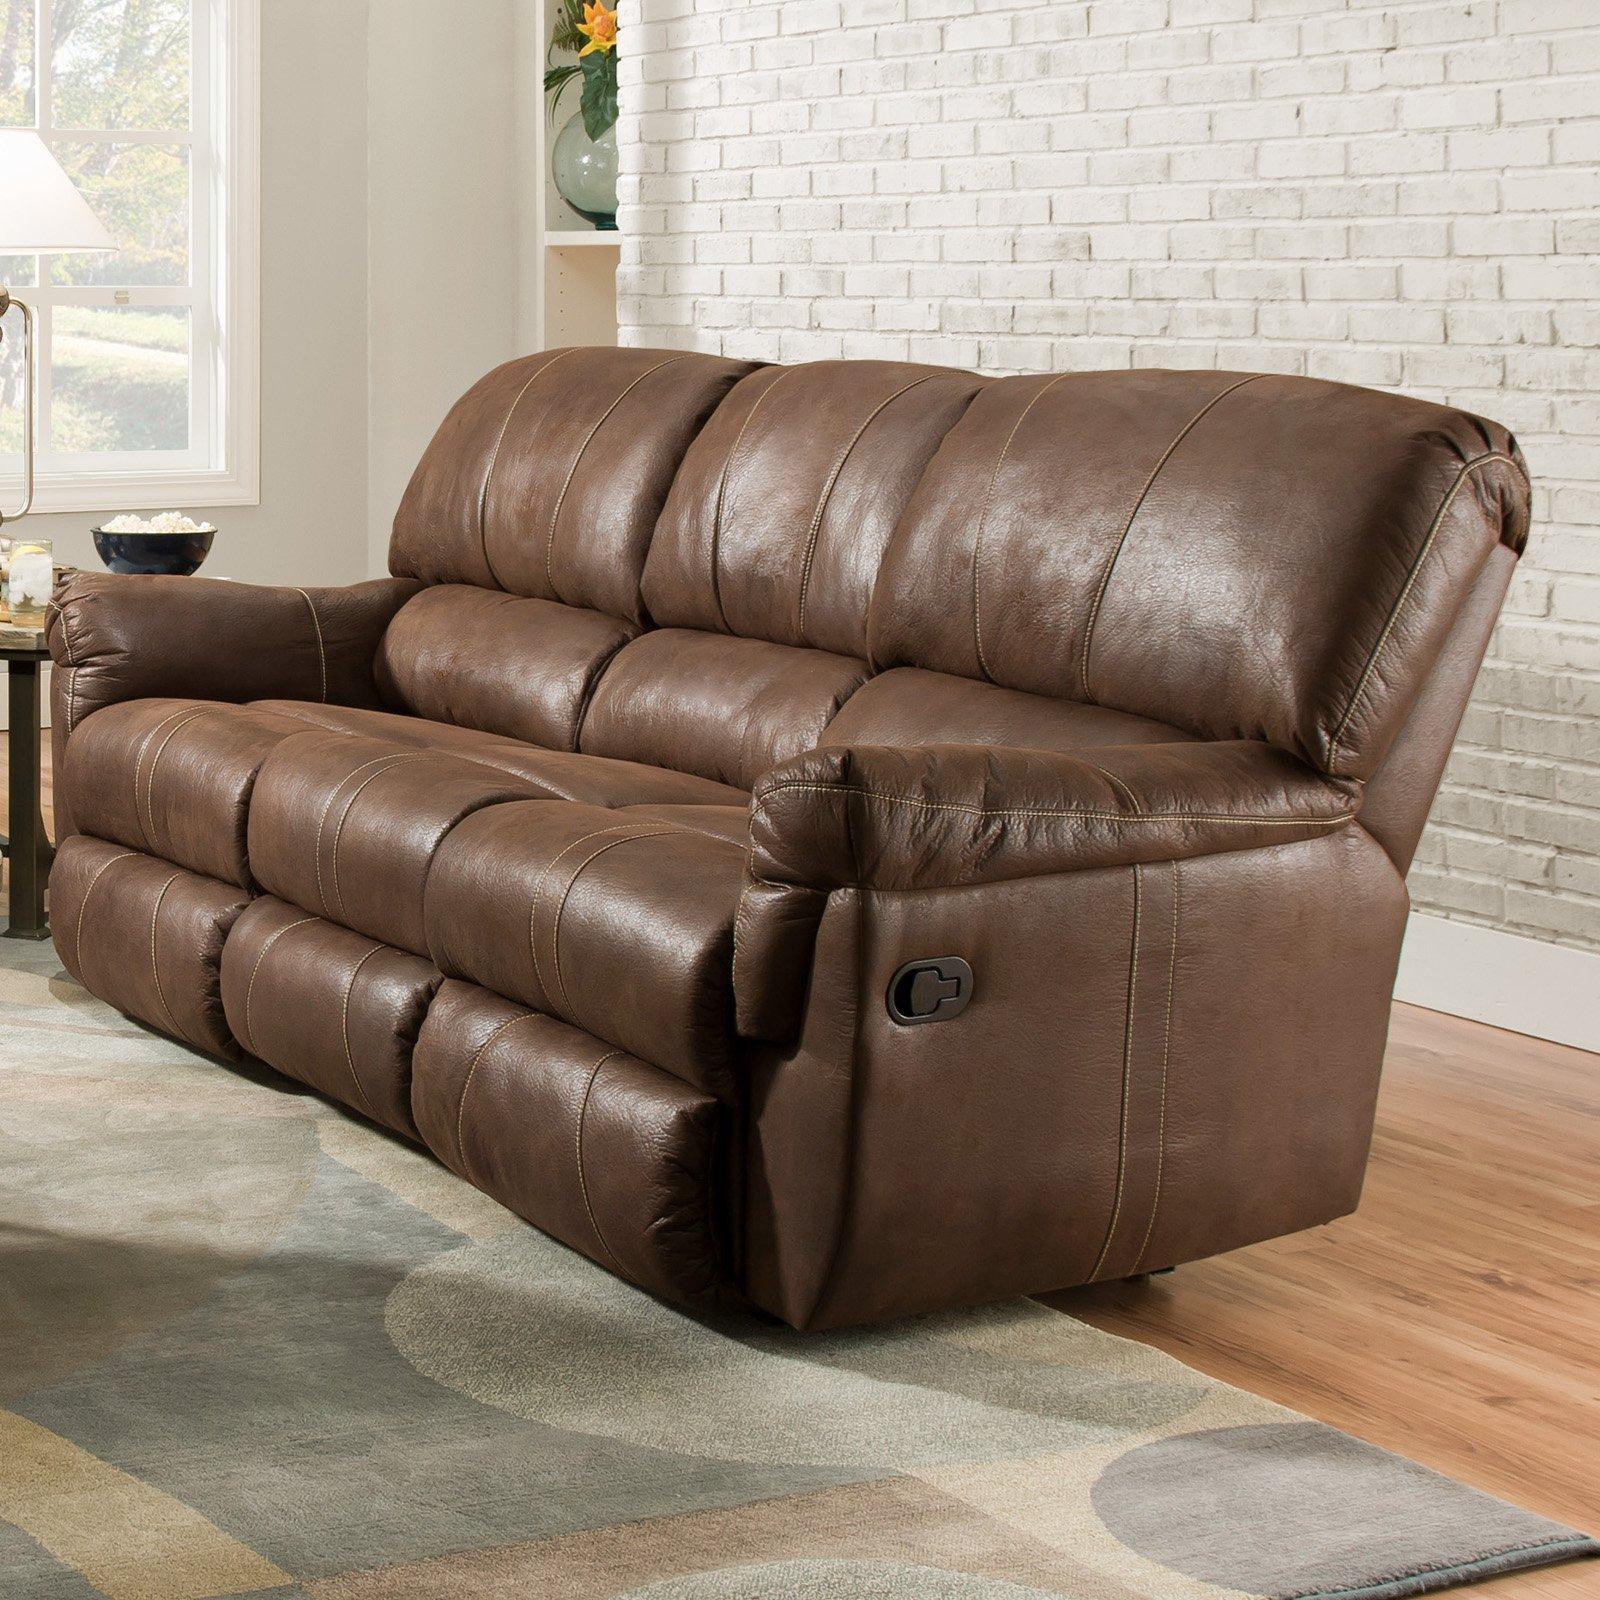 Simmons Upholstery Wisconsin Beautyrest Sofa – Chocolate | Hayneedle Regarding Simmons Leather Sofas (Image 17 of 20)